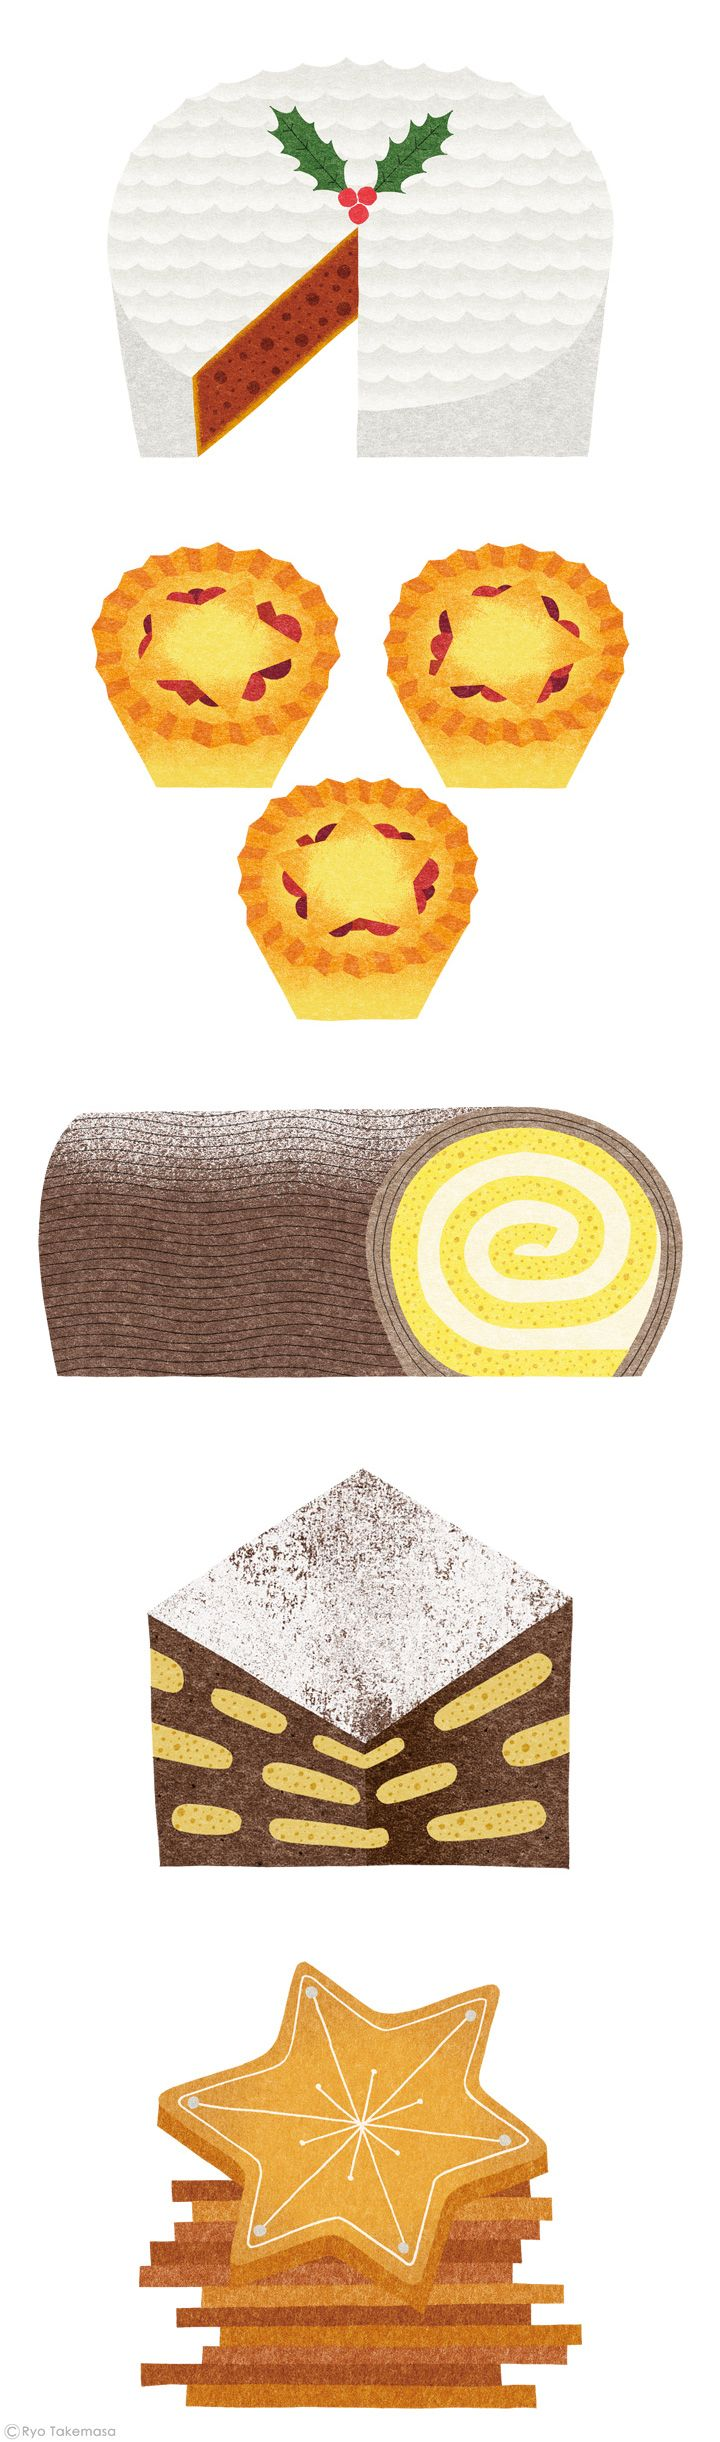 Christmas food illustrations by Ryo Takemasa